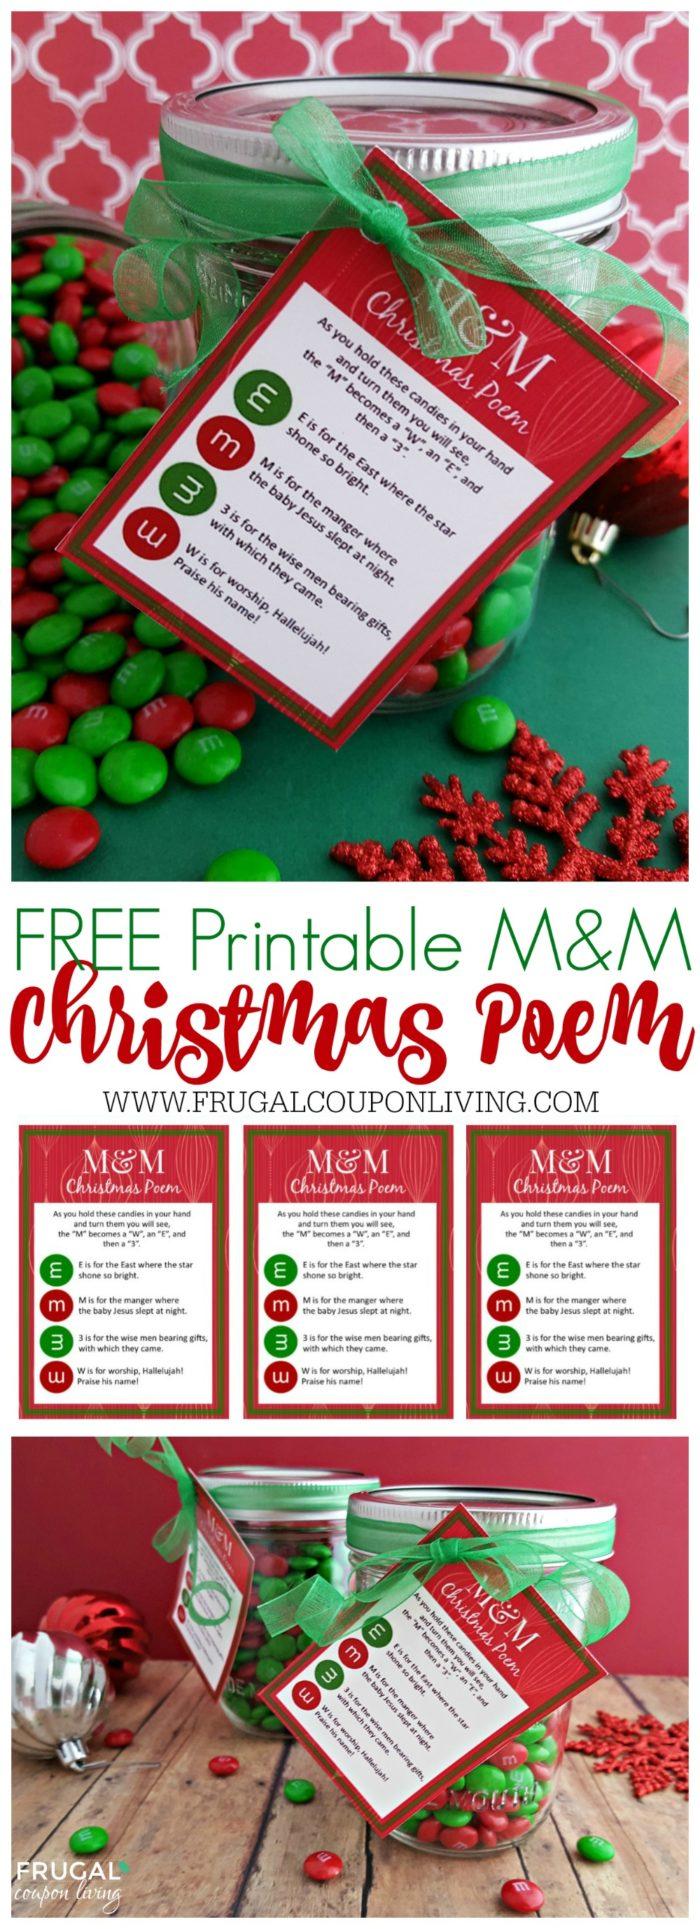 M&M-printable-poem-Frugal-Coupon-living